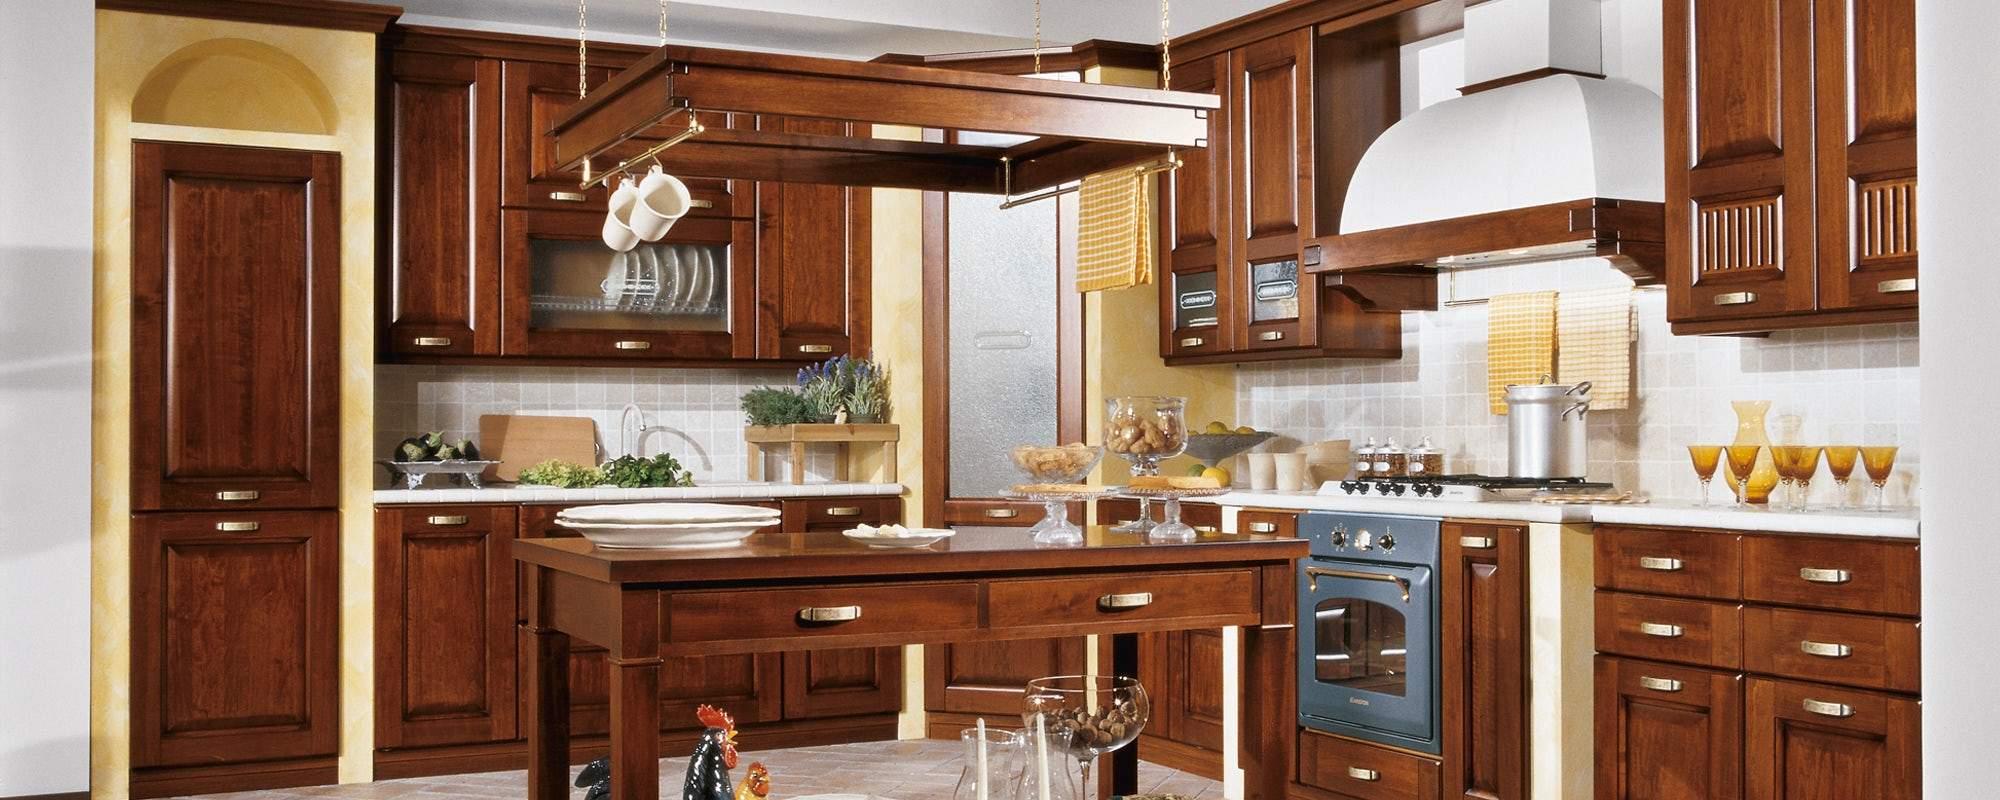 Malaga de simon arredamenti for Stosa cucina